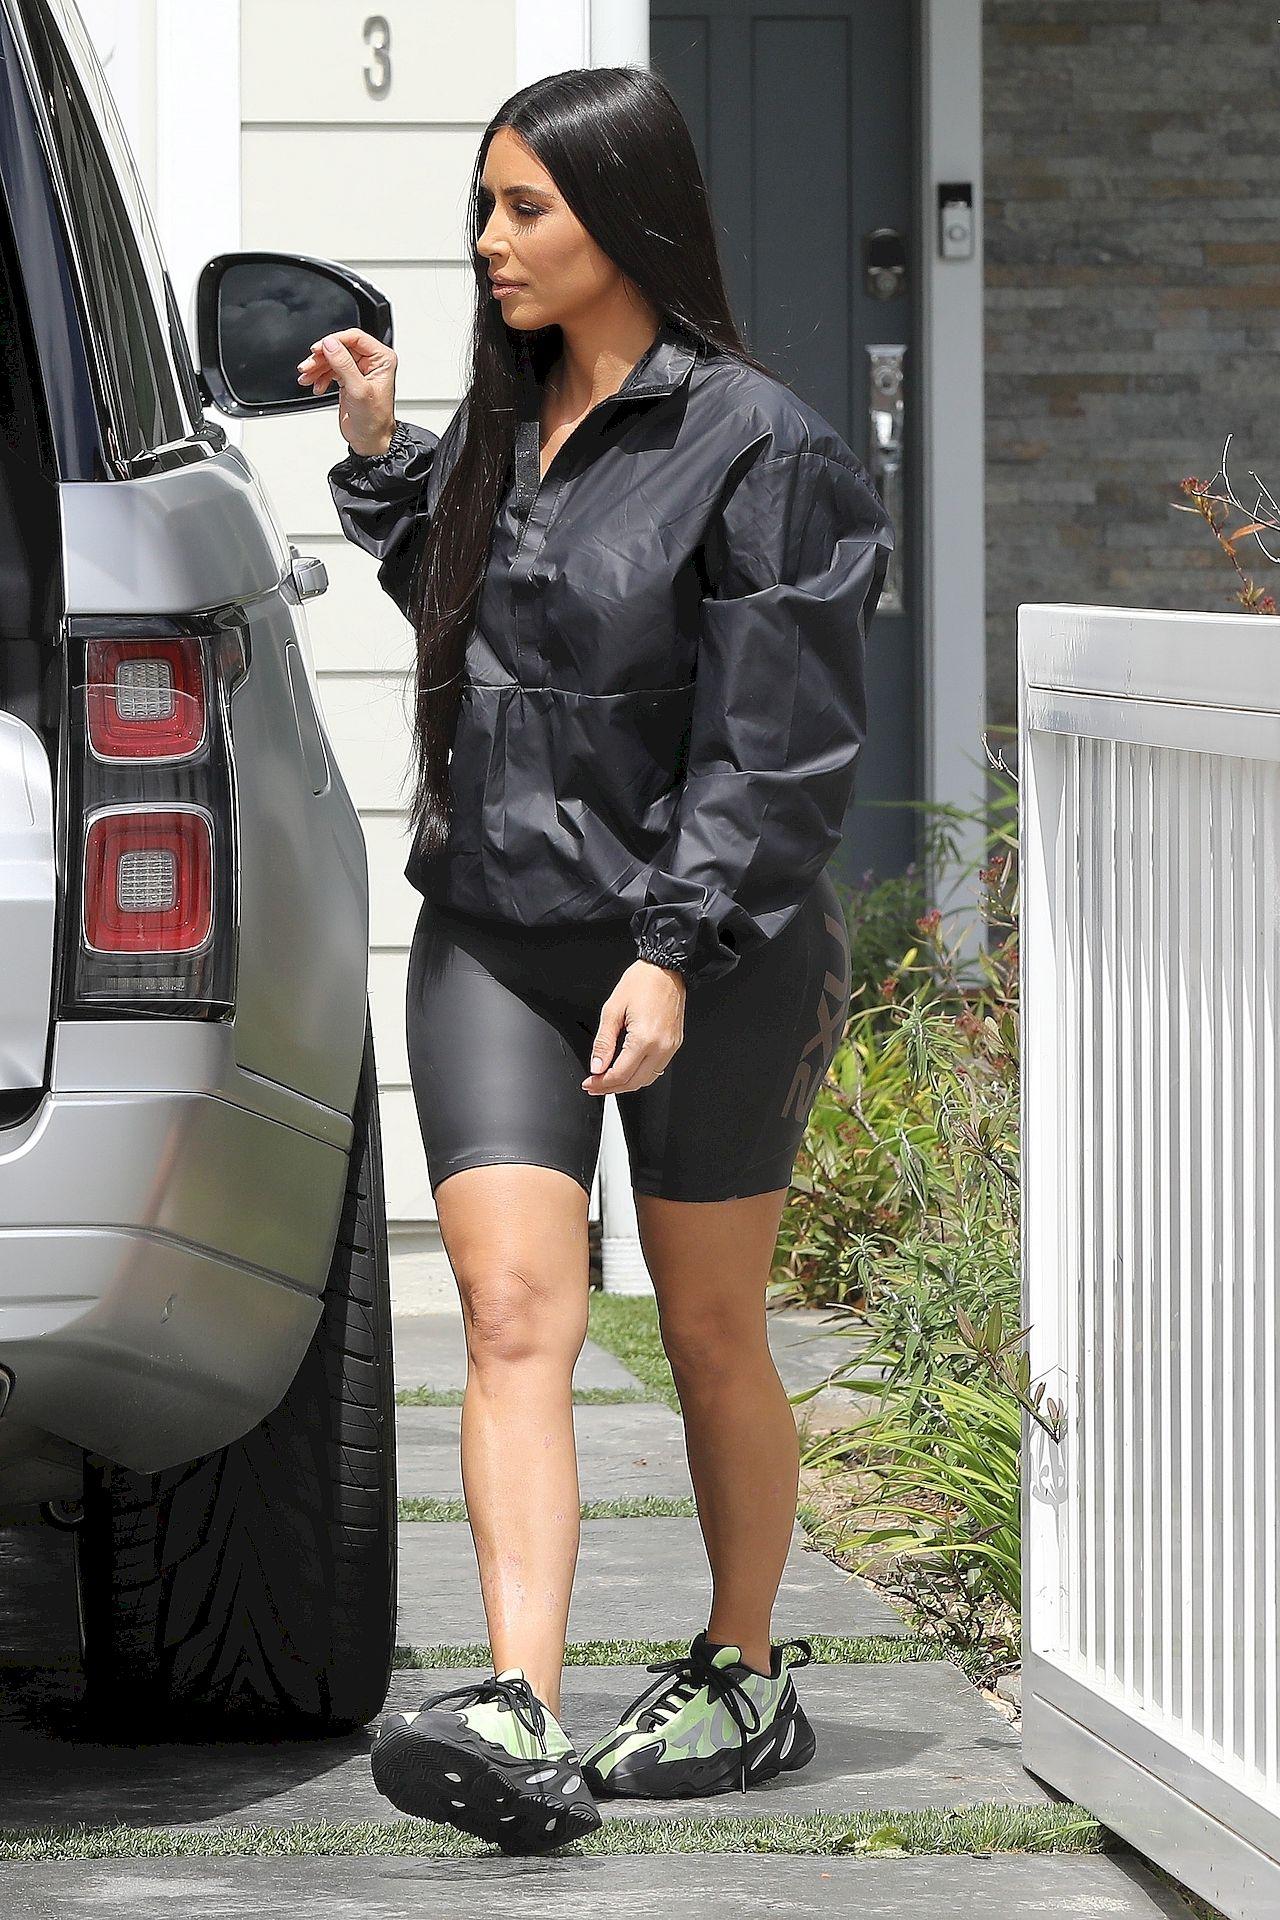 *EXCLUSIVE* Kim Kardashian takes daughter North West to meet JoJo Siwa for video collaboration **WEB MUST CALL FOR PRICING** Kim Kardashian